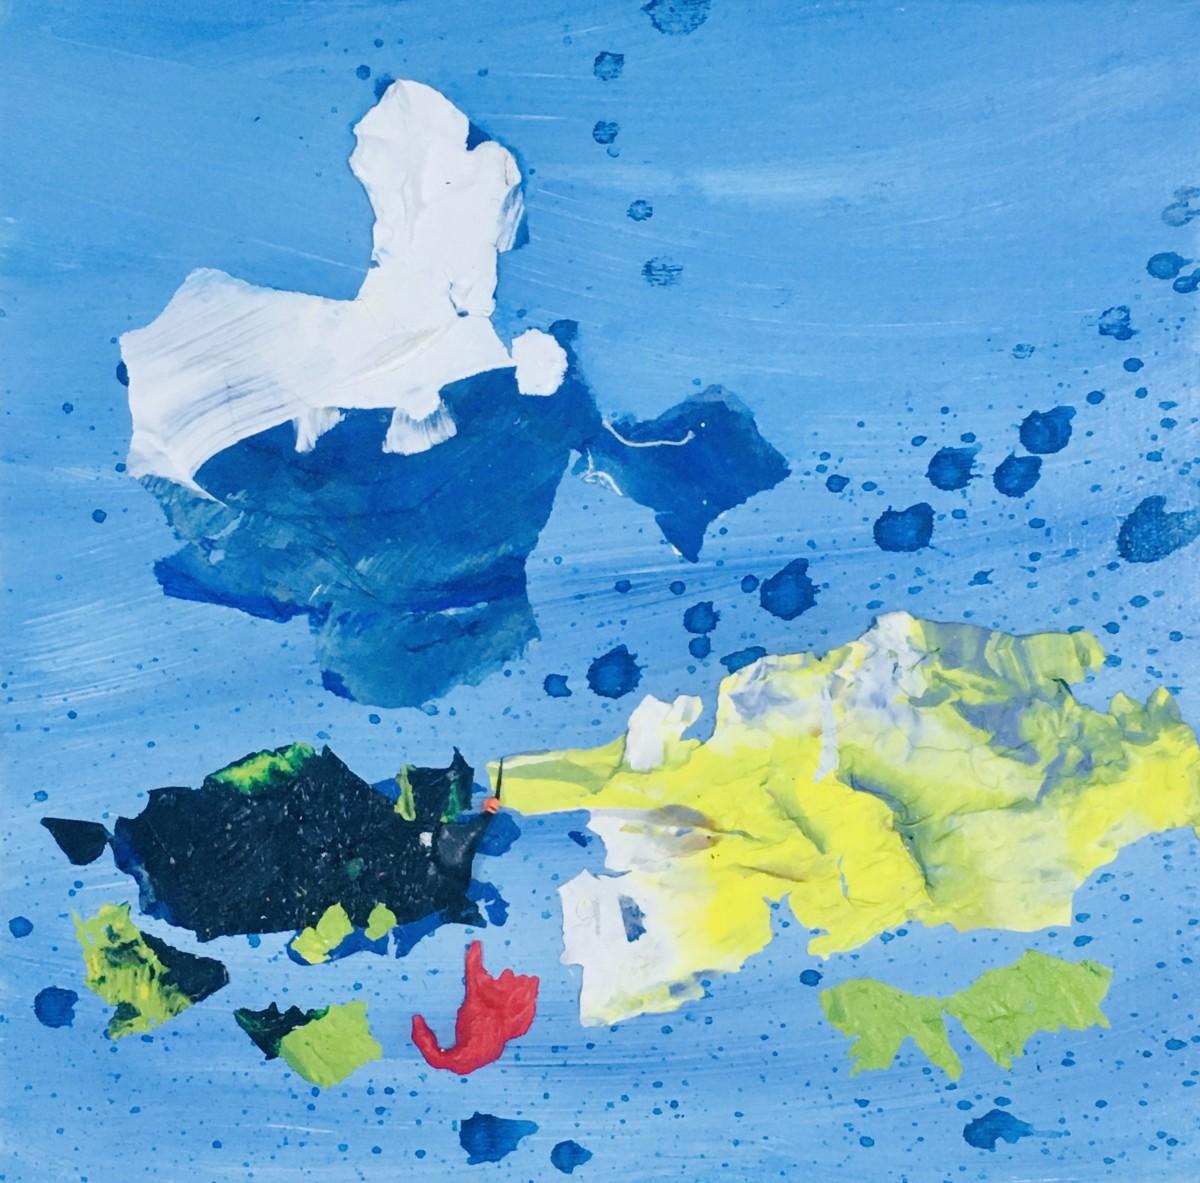 Make a Splash no.3 by Julea Boswell